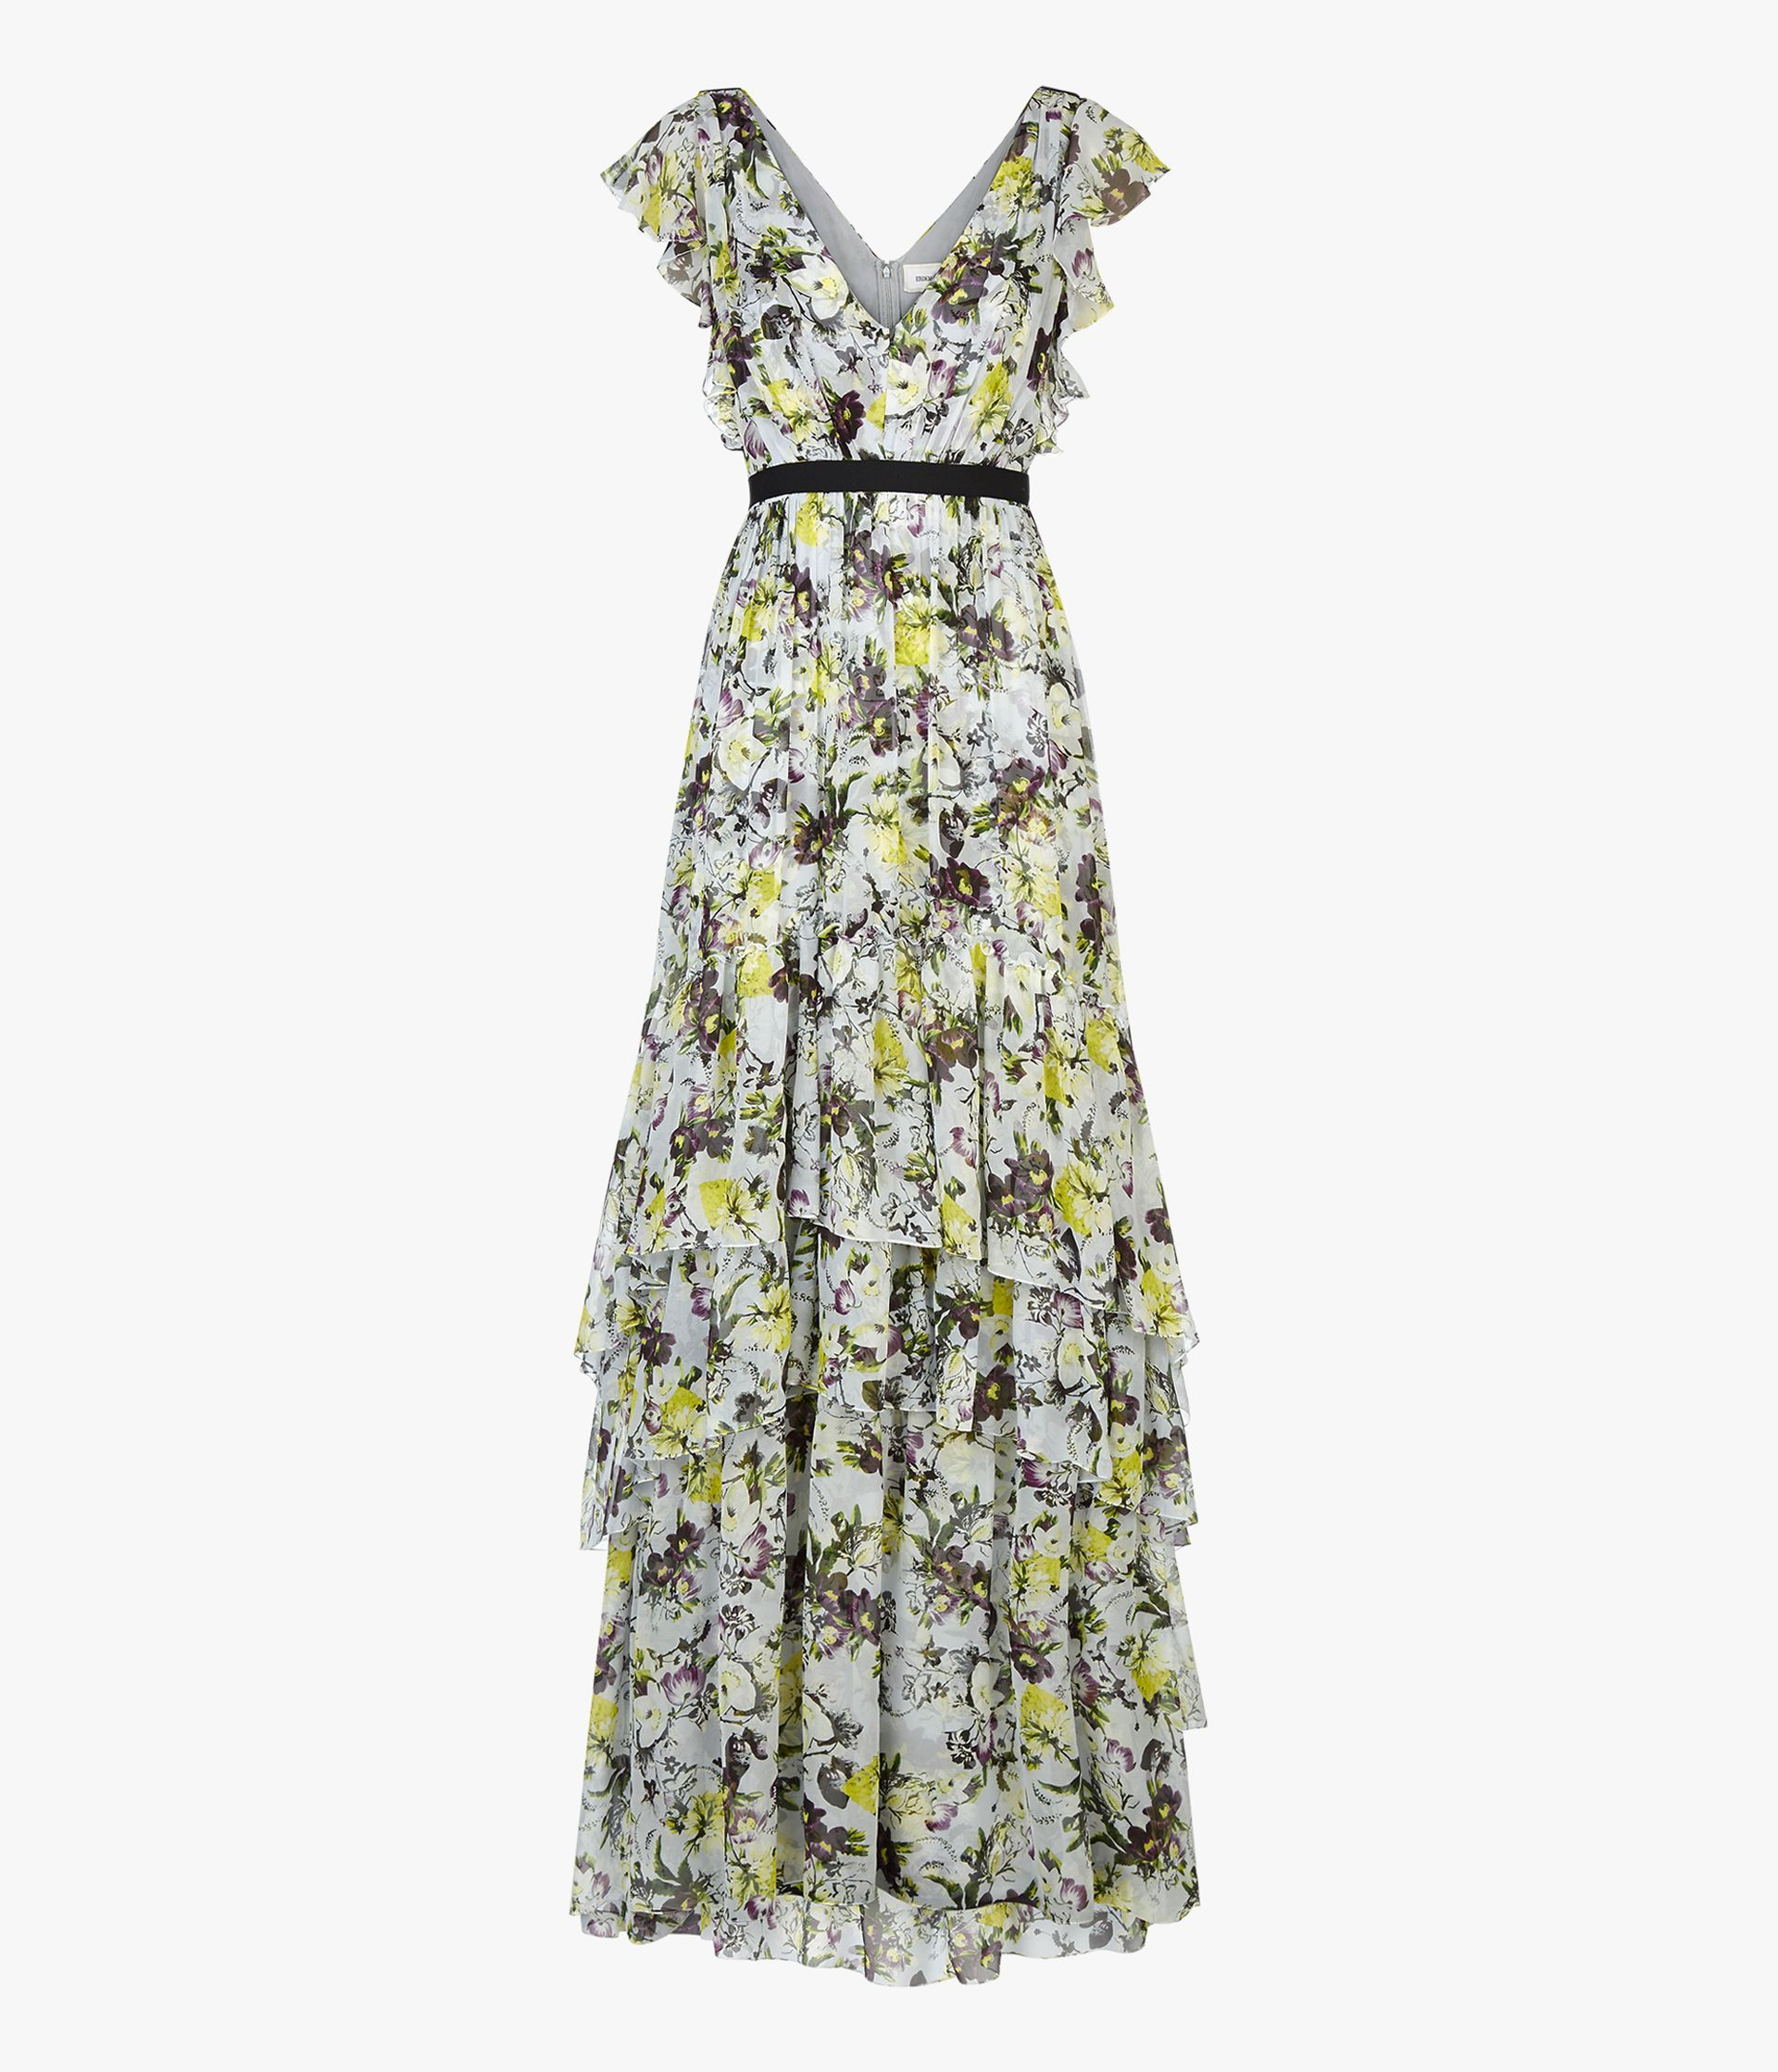 Lovable Erdem Prints | Mesmerizing Erdem Dress